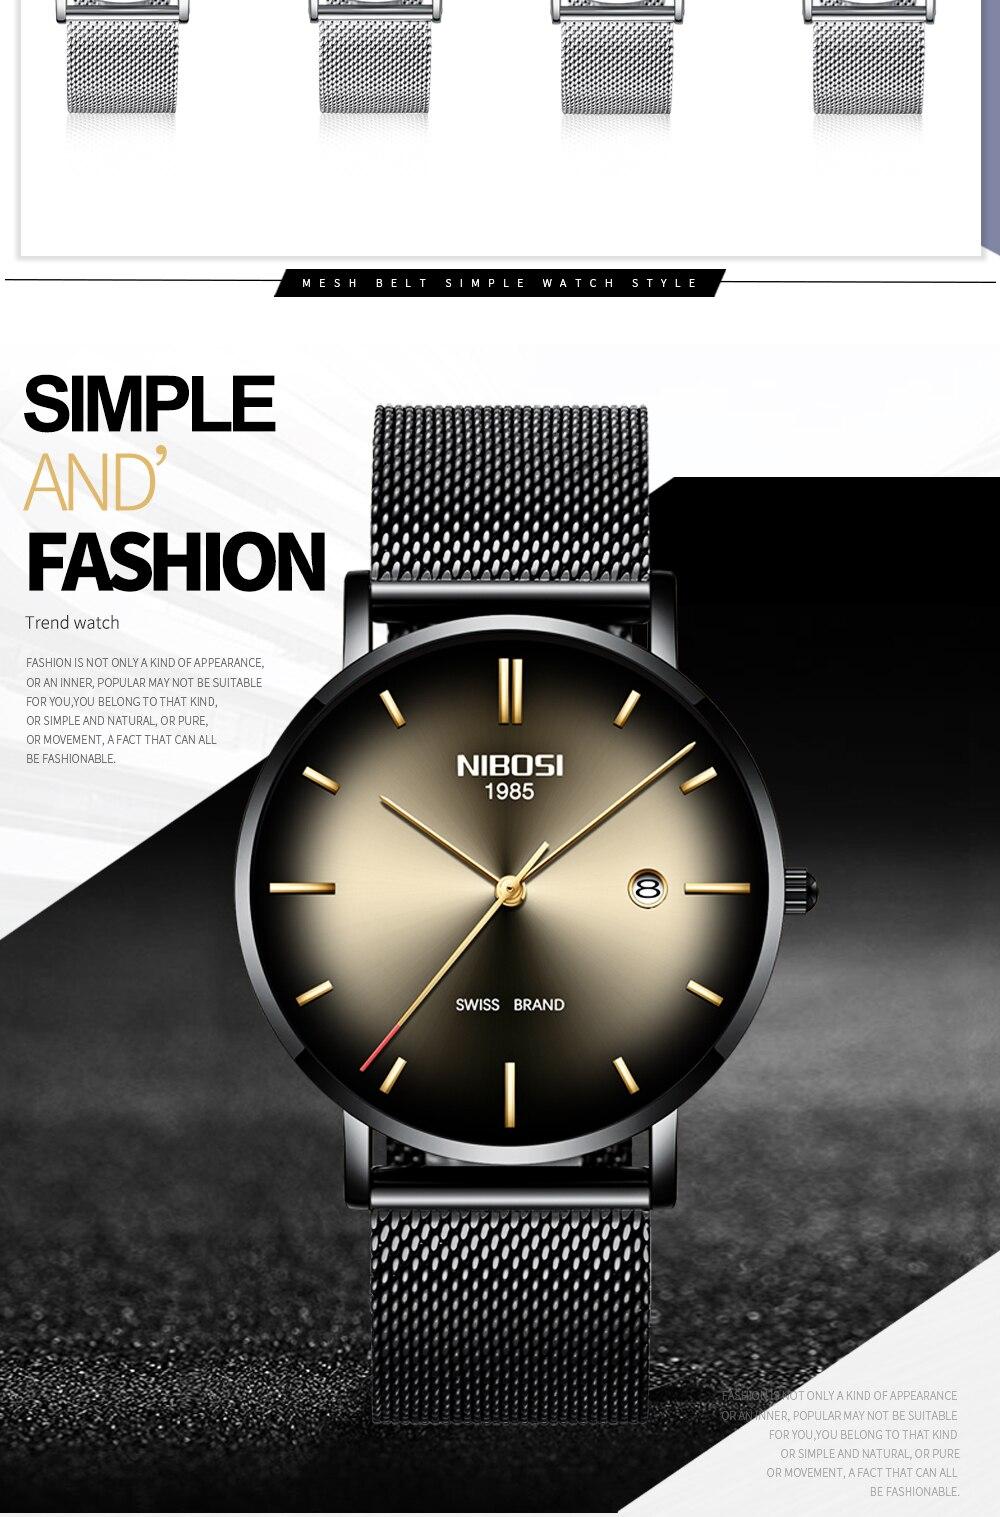 HTB1NGLMazzuK1RjSspeq6ziHVXa4 NIBOSI Watch Men Simple Fashion Swiss Brand Quartz Watch Luxury Creative Waterproof Date Casual Men Watches Relogio Masculino